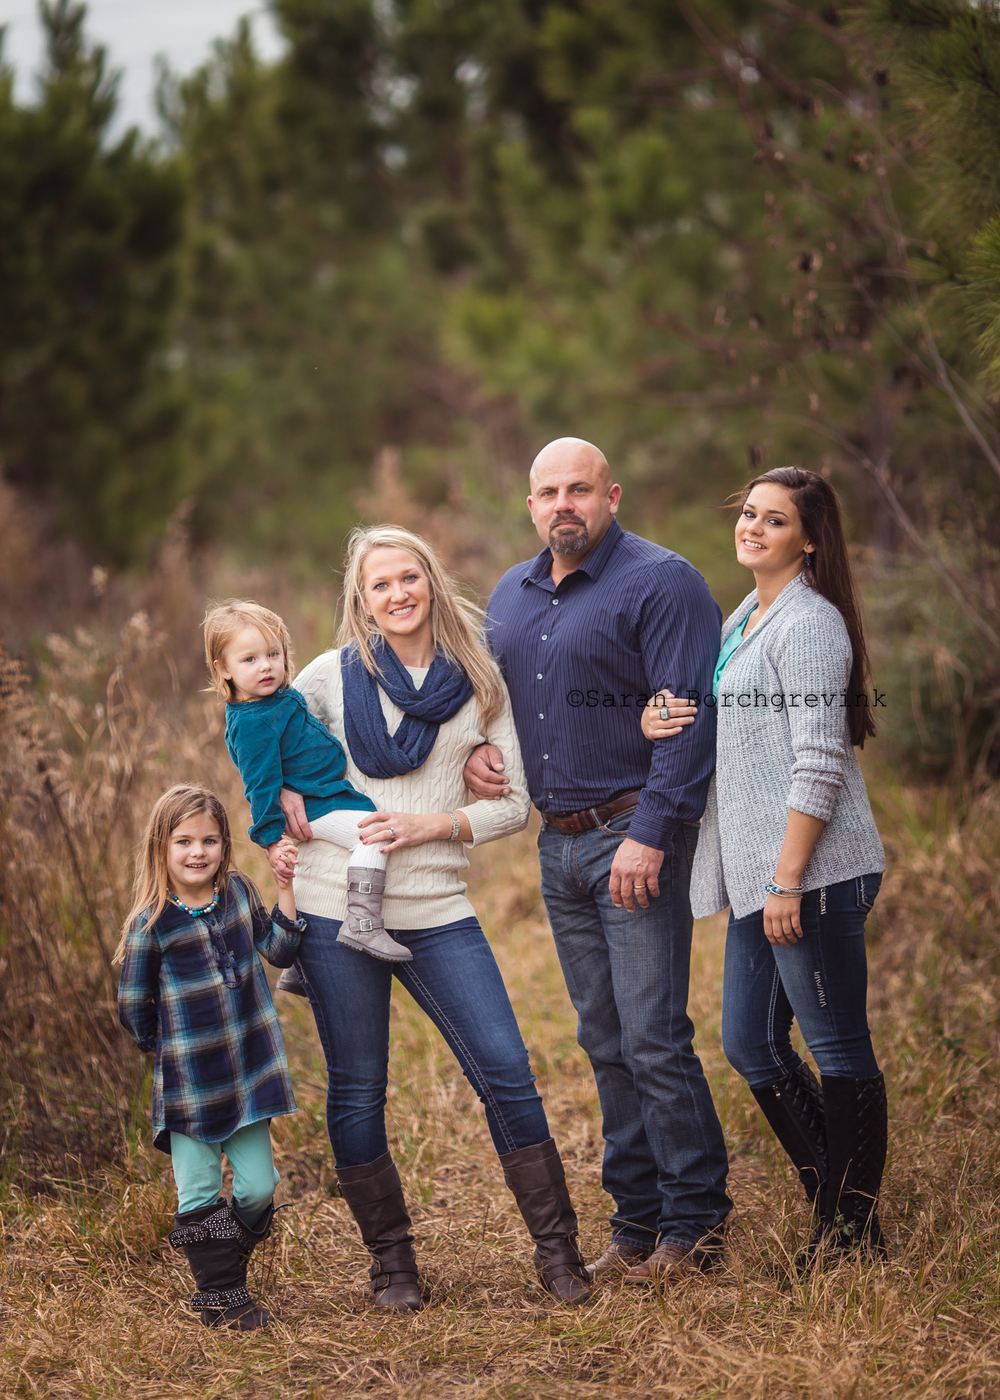 cypress, texas family photography. Sarah Borchgrevink Photography. www.sarahborchgrevinkphotography.com